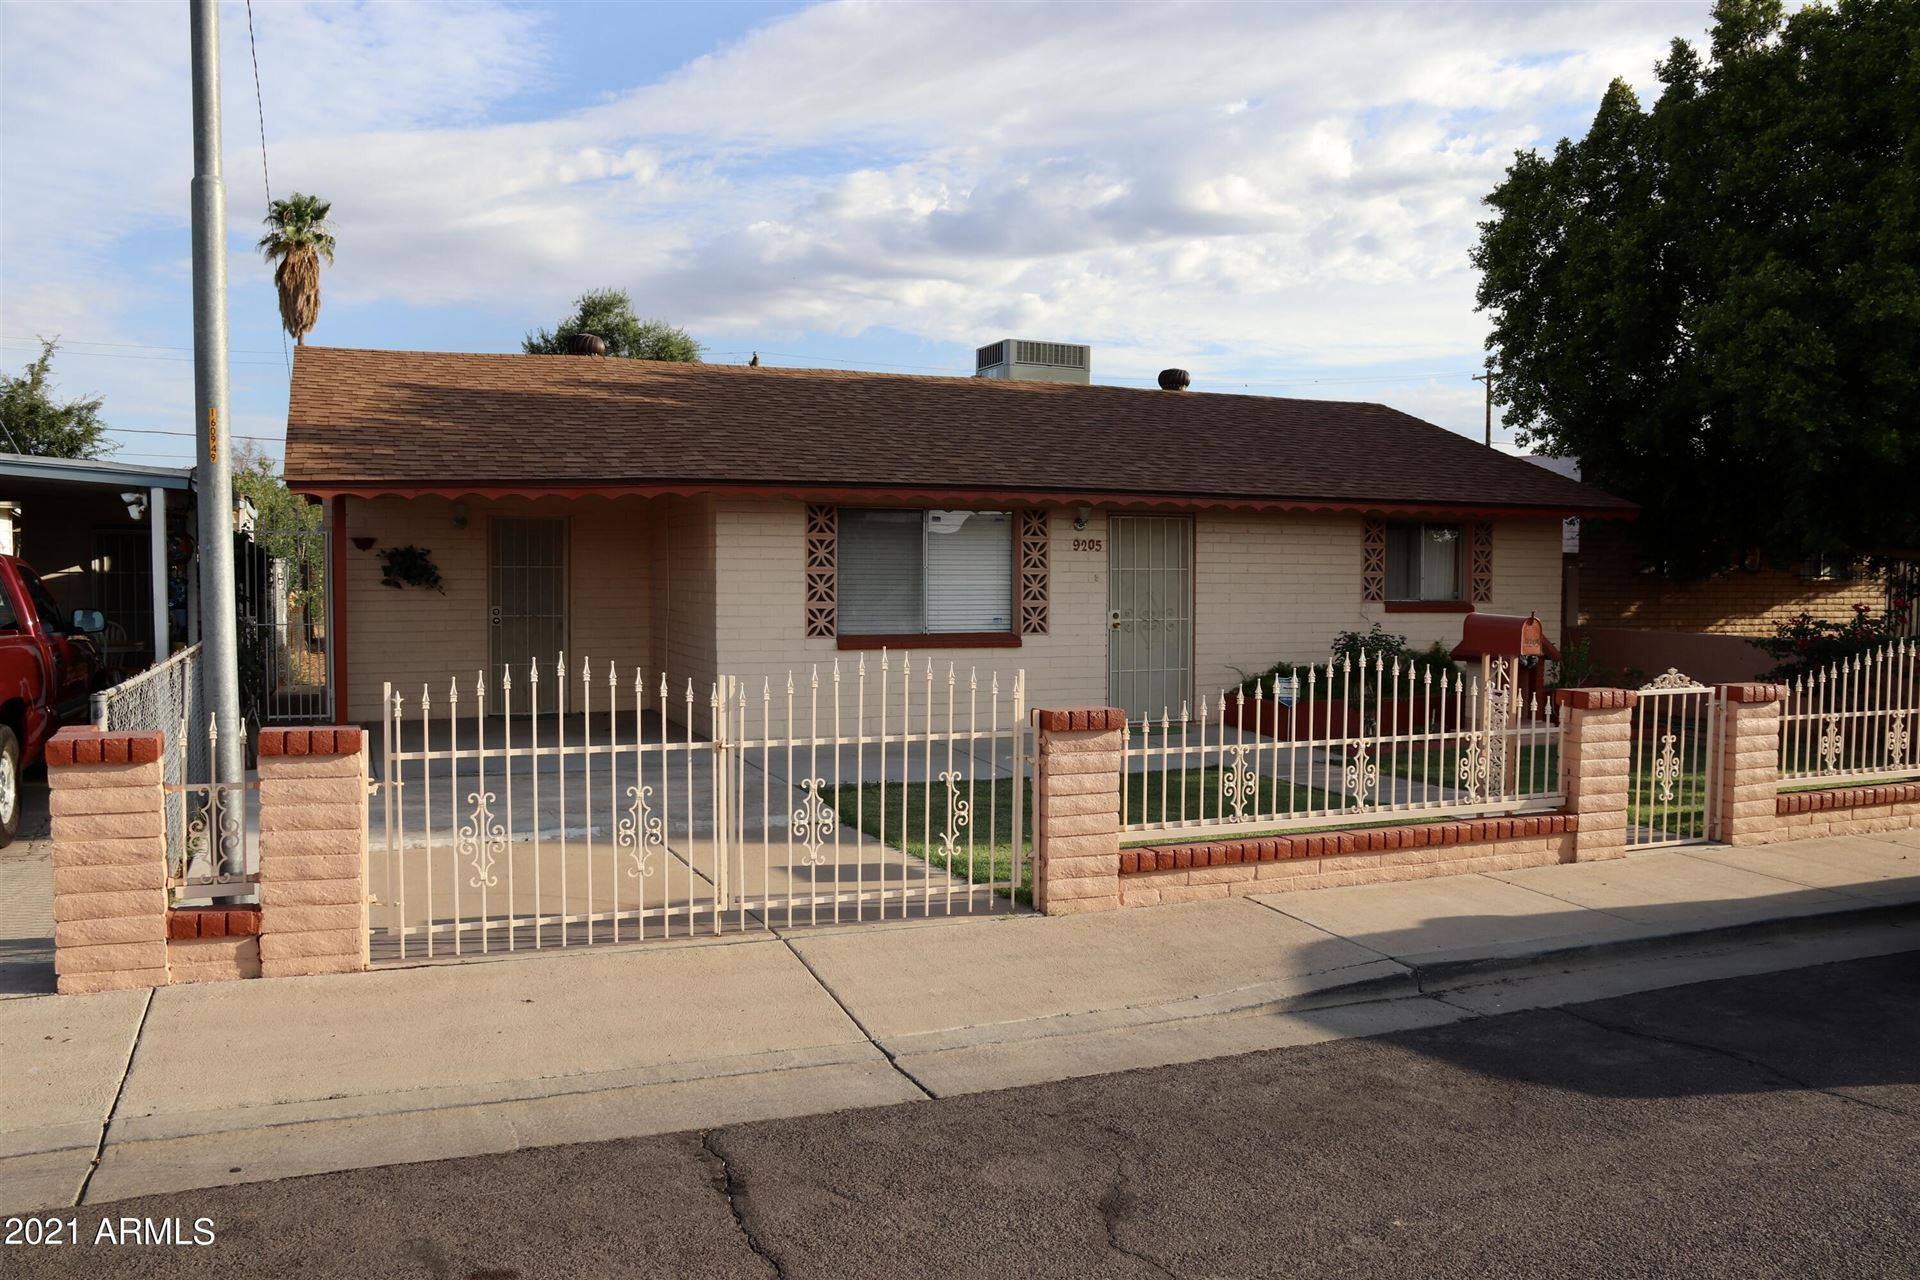 Photo of 9205 W FILLMORE Street, Tolleson, AZ 85353 (MLS # 6269930)